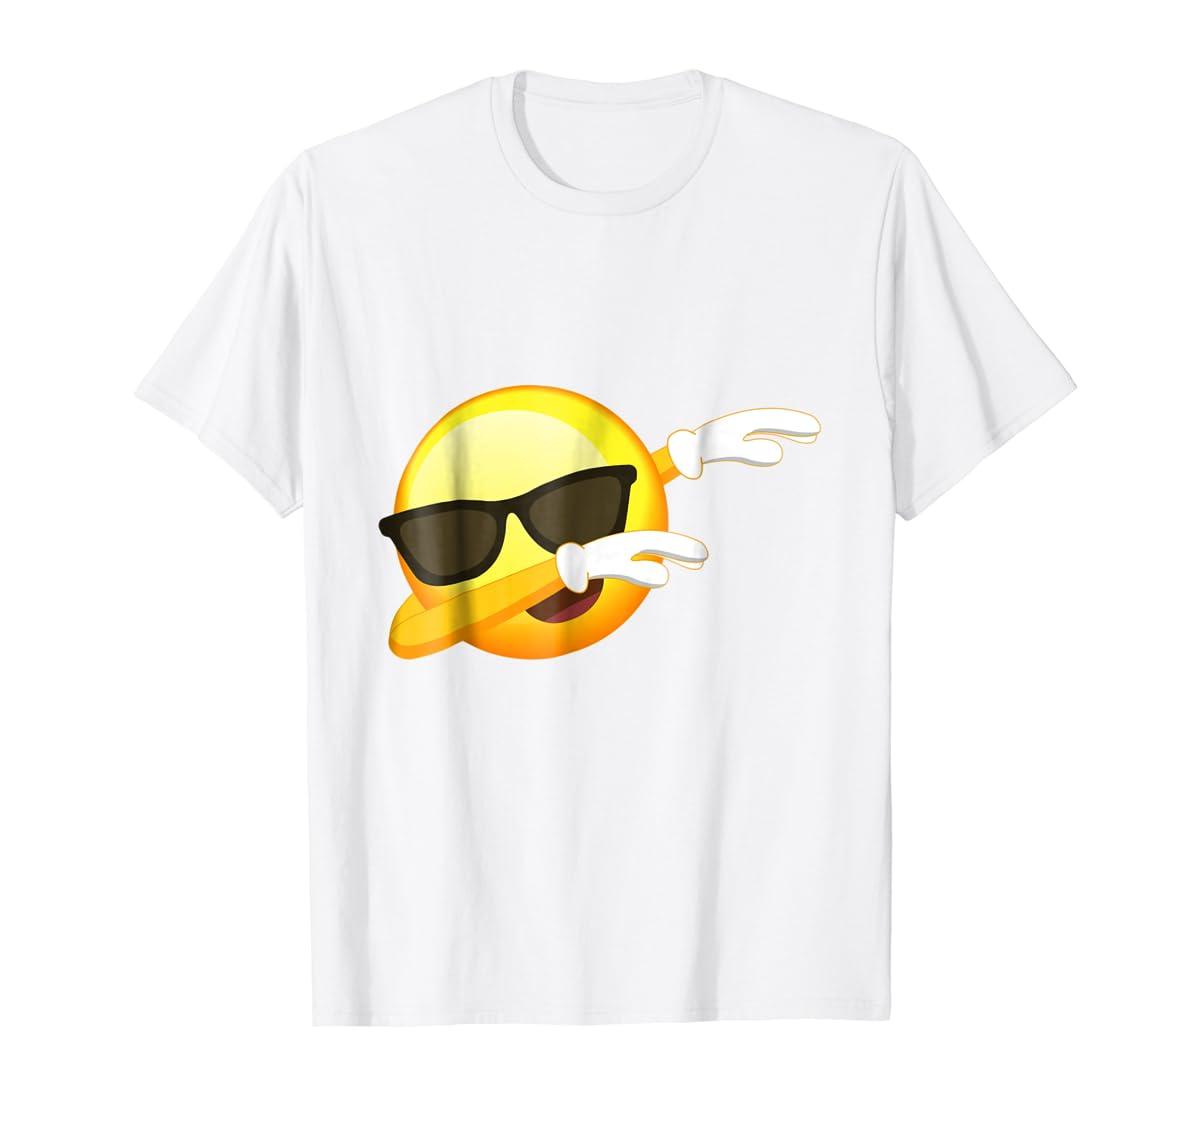 Funny Dabbing Emoji Shirt - Cool Emoji Dab T-Shirt-Men's T-Shirt-White